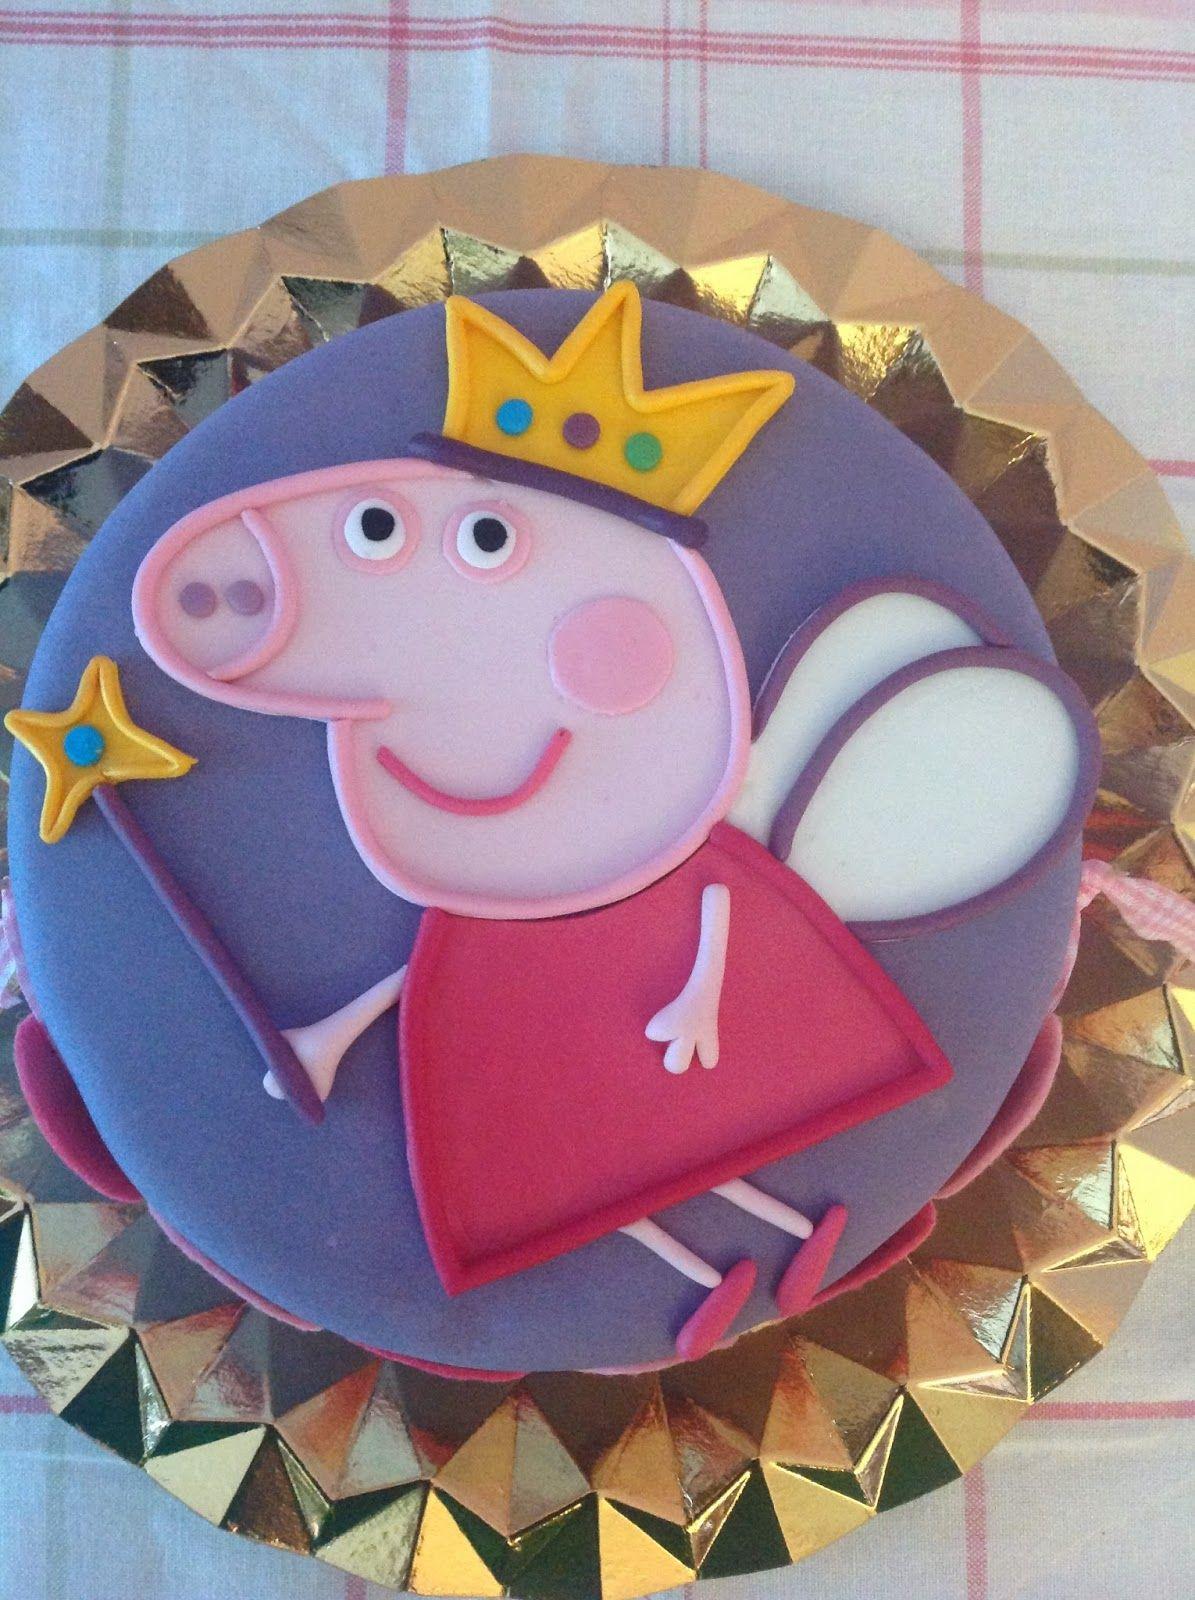 jpg tortas pinterest peppa pig tartas de peppa pig y contento